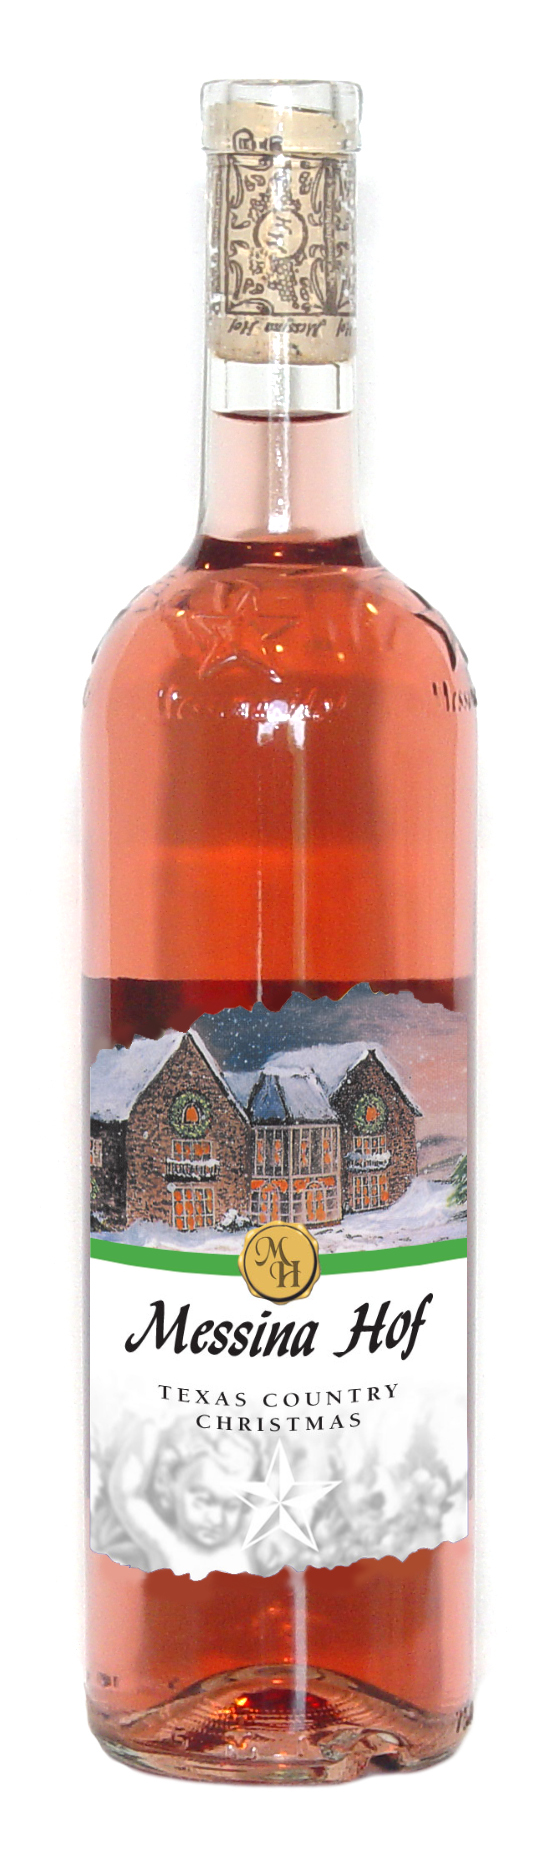 Collection Messina Hof Winery Resort Wine Bottle Zinfandel Fermentation